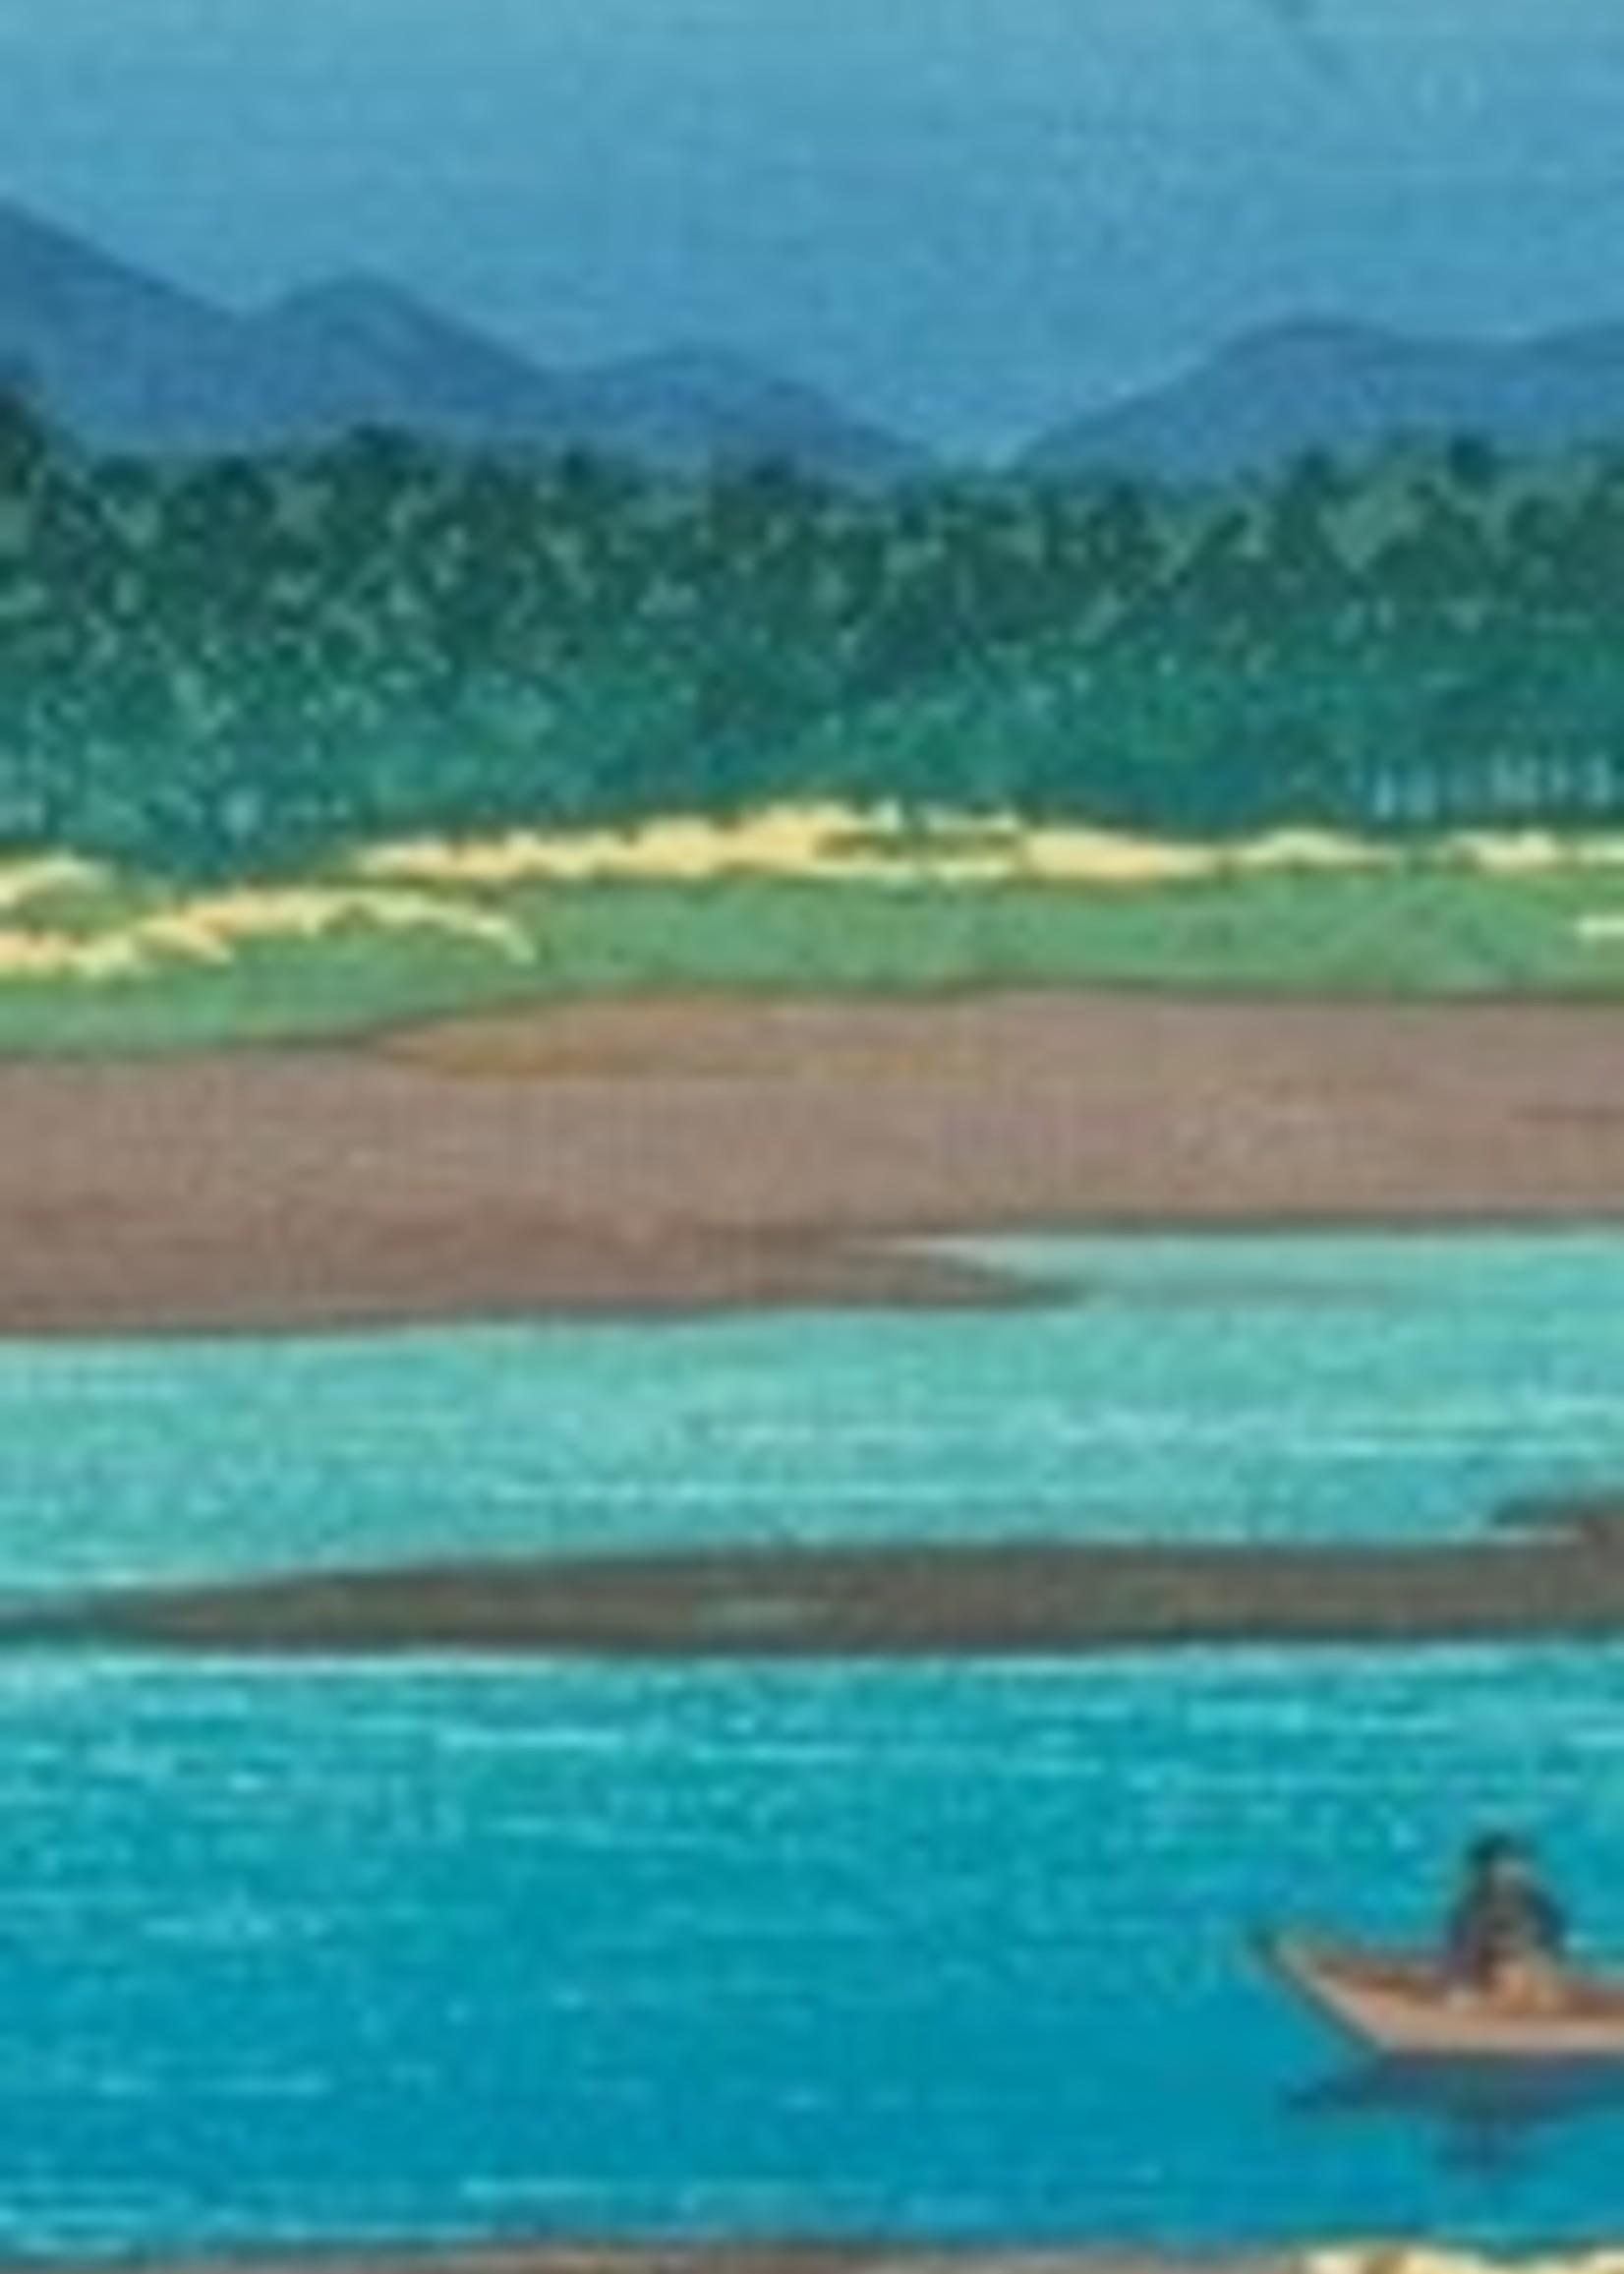 Mt. Fuji view from River Banyu Bookmark